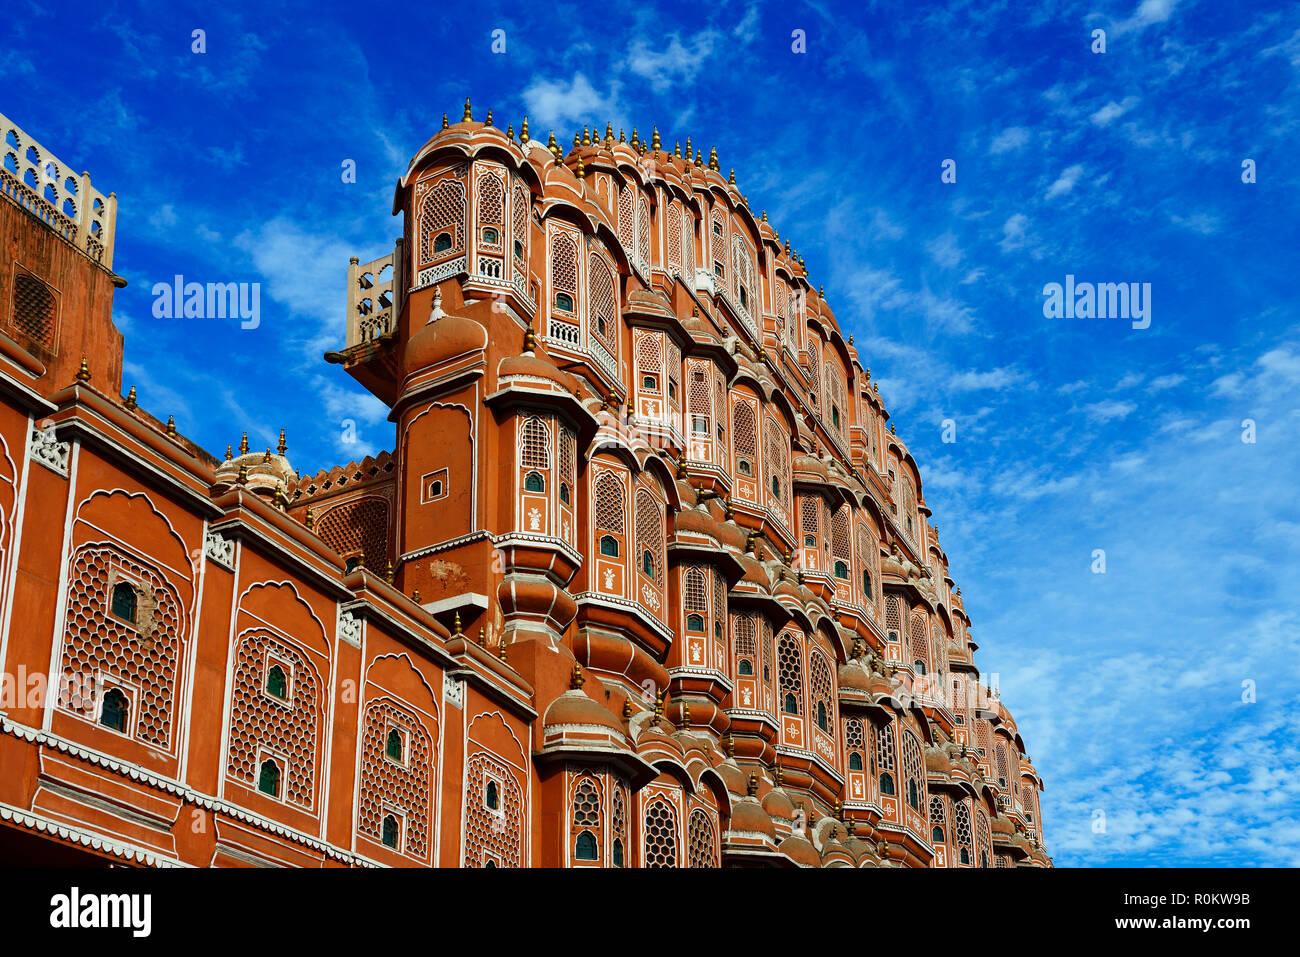 Façade, Hawa Mahal, le palais des vents, Jaipur, Rajasthan, Inde Photo Stock